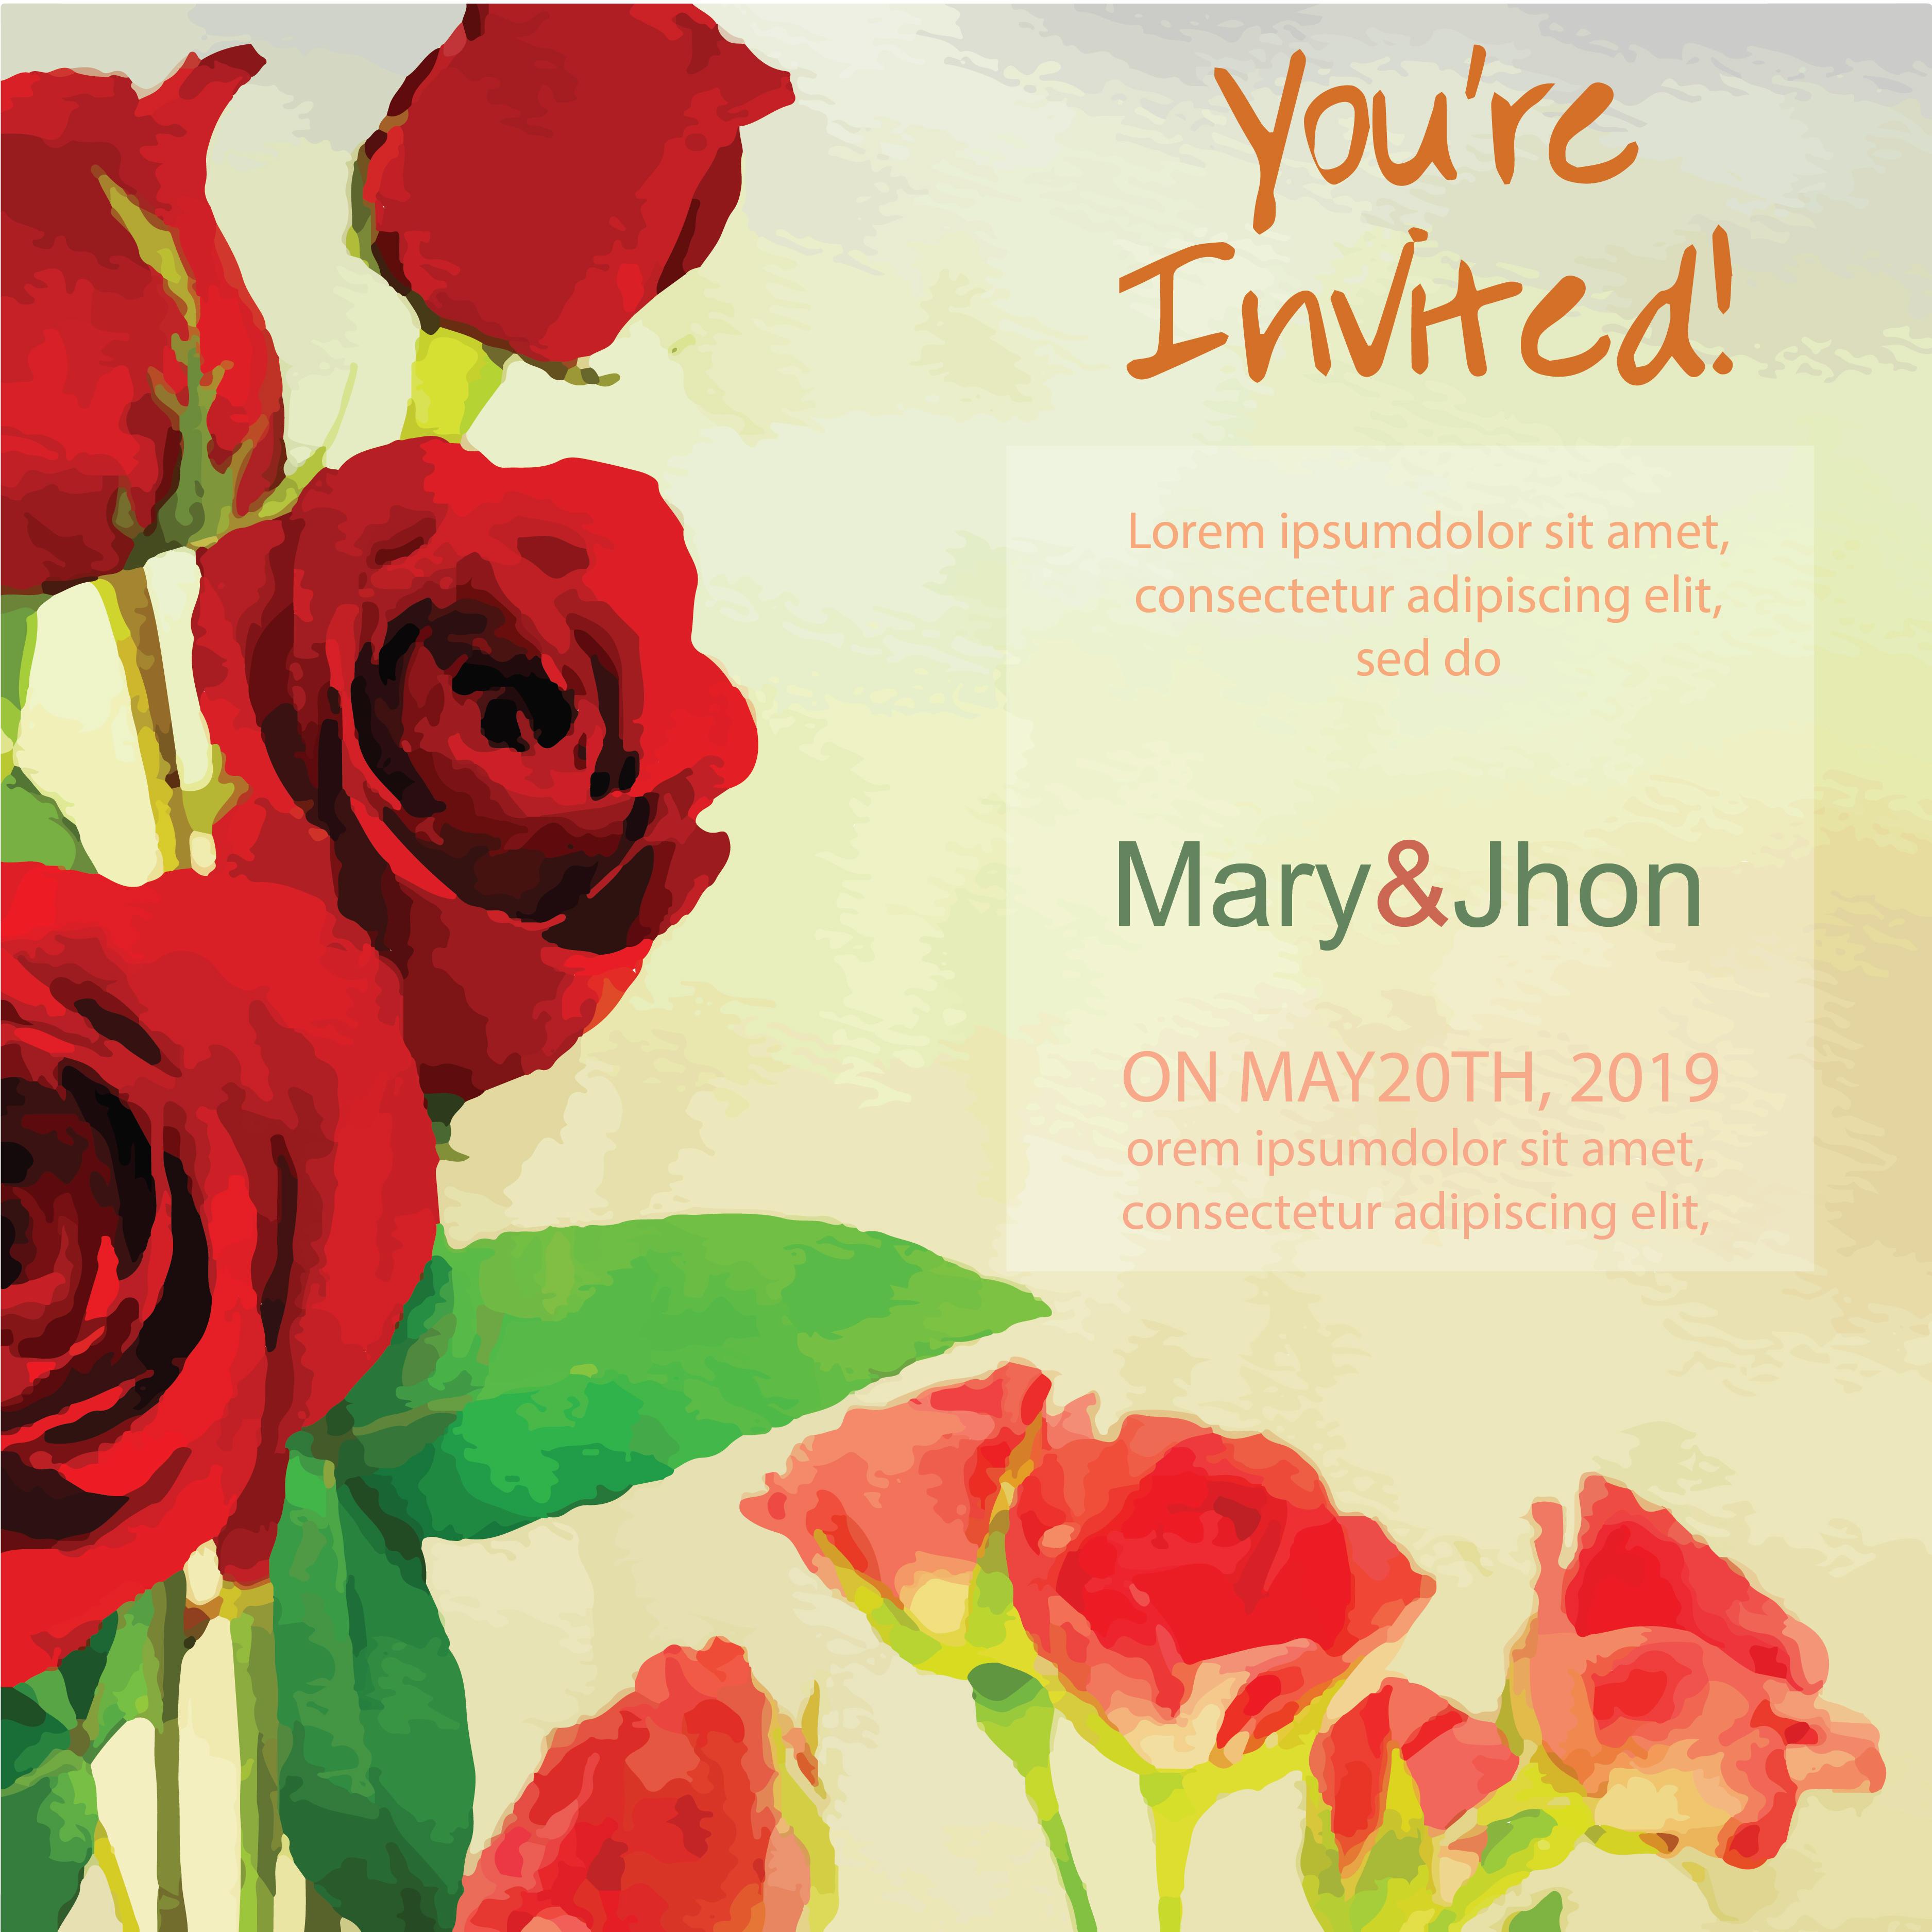 Watercolor Marriage Invitation Card Vector Graphics | 123Freevectors